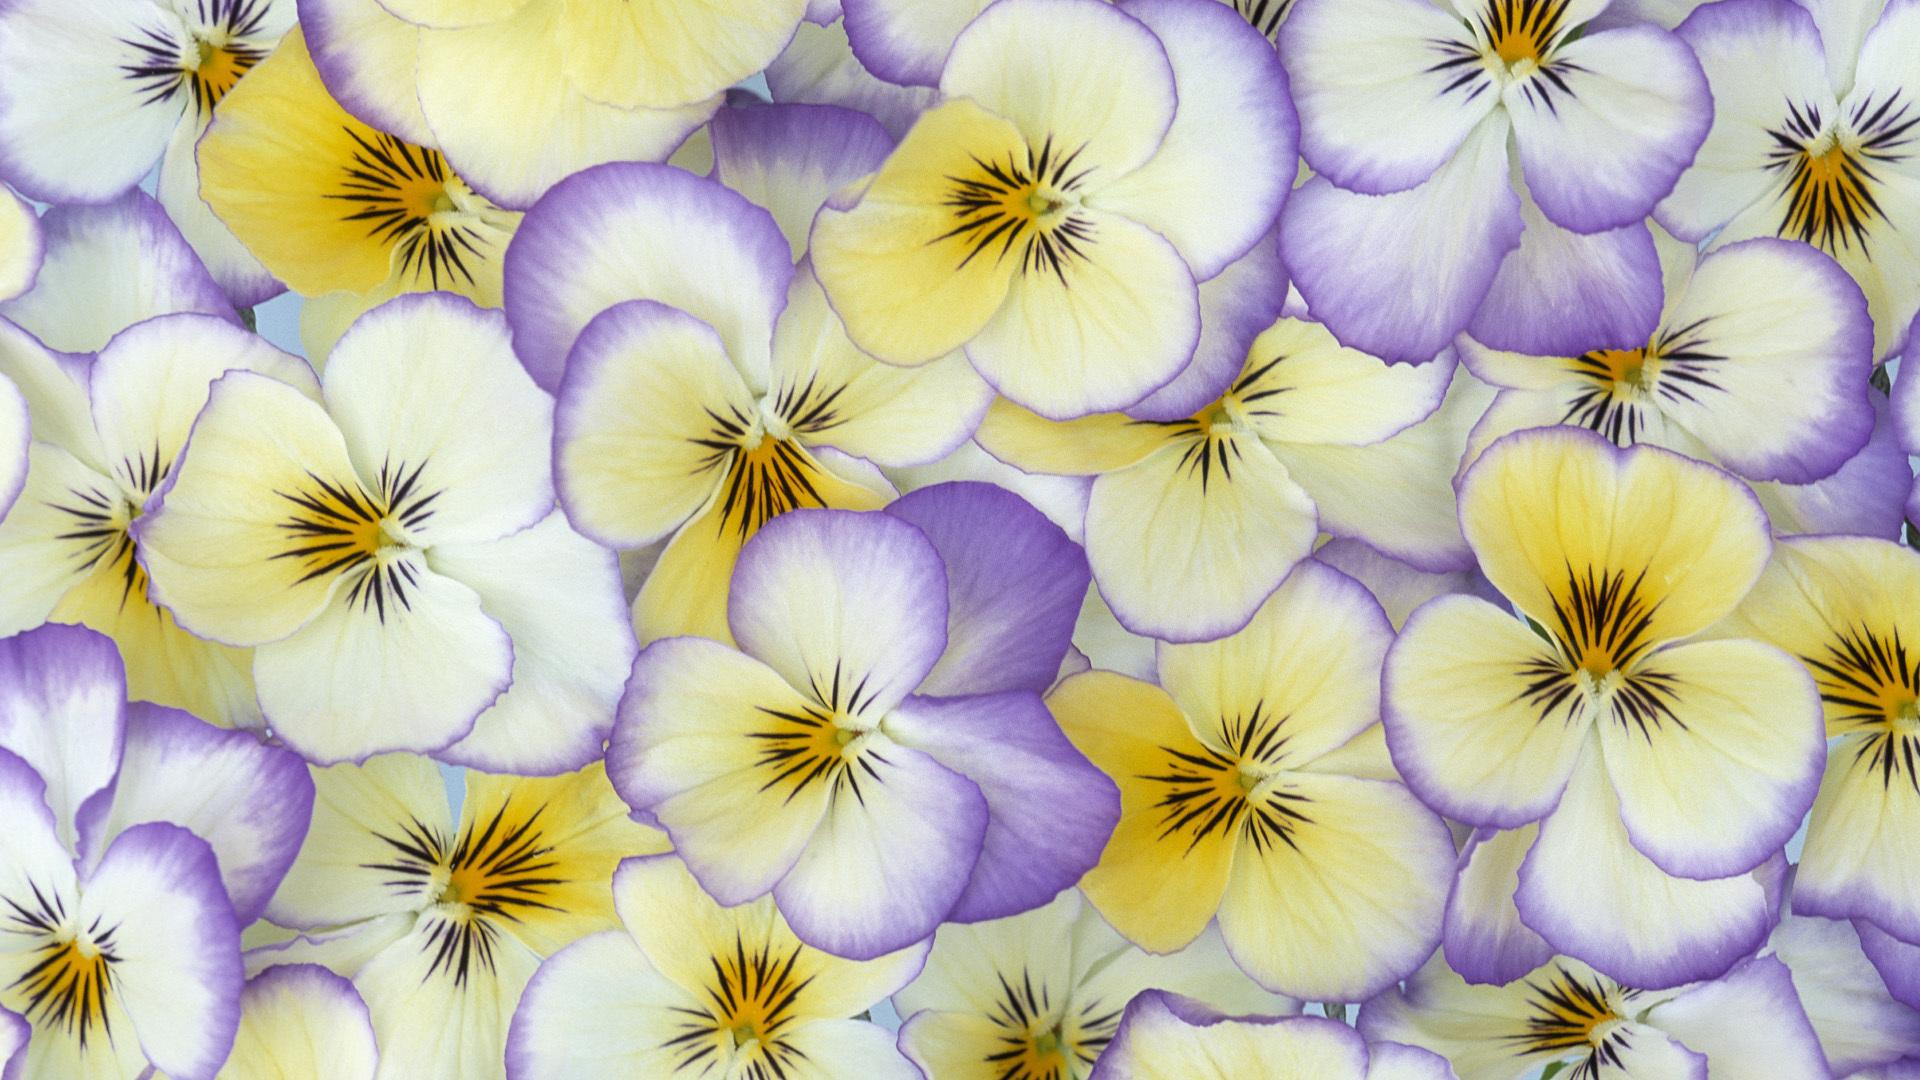 pansy flower petals wallpaper 50004